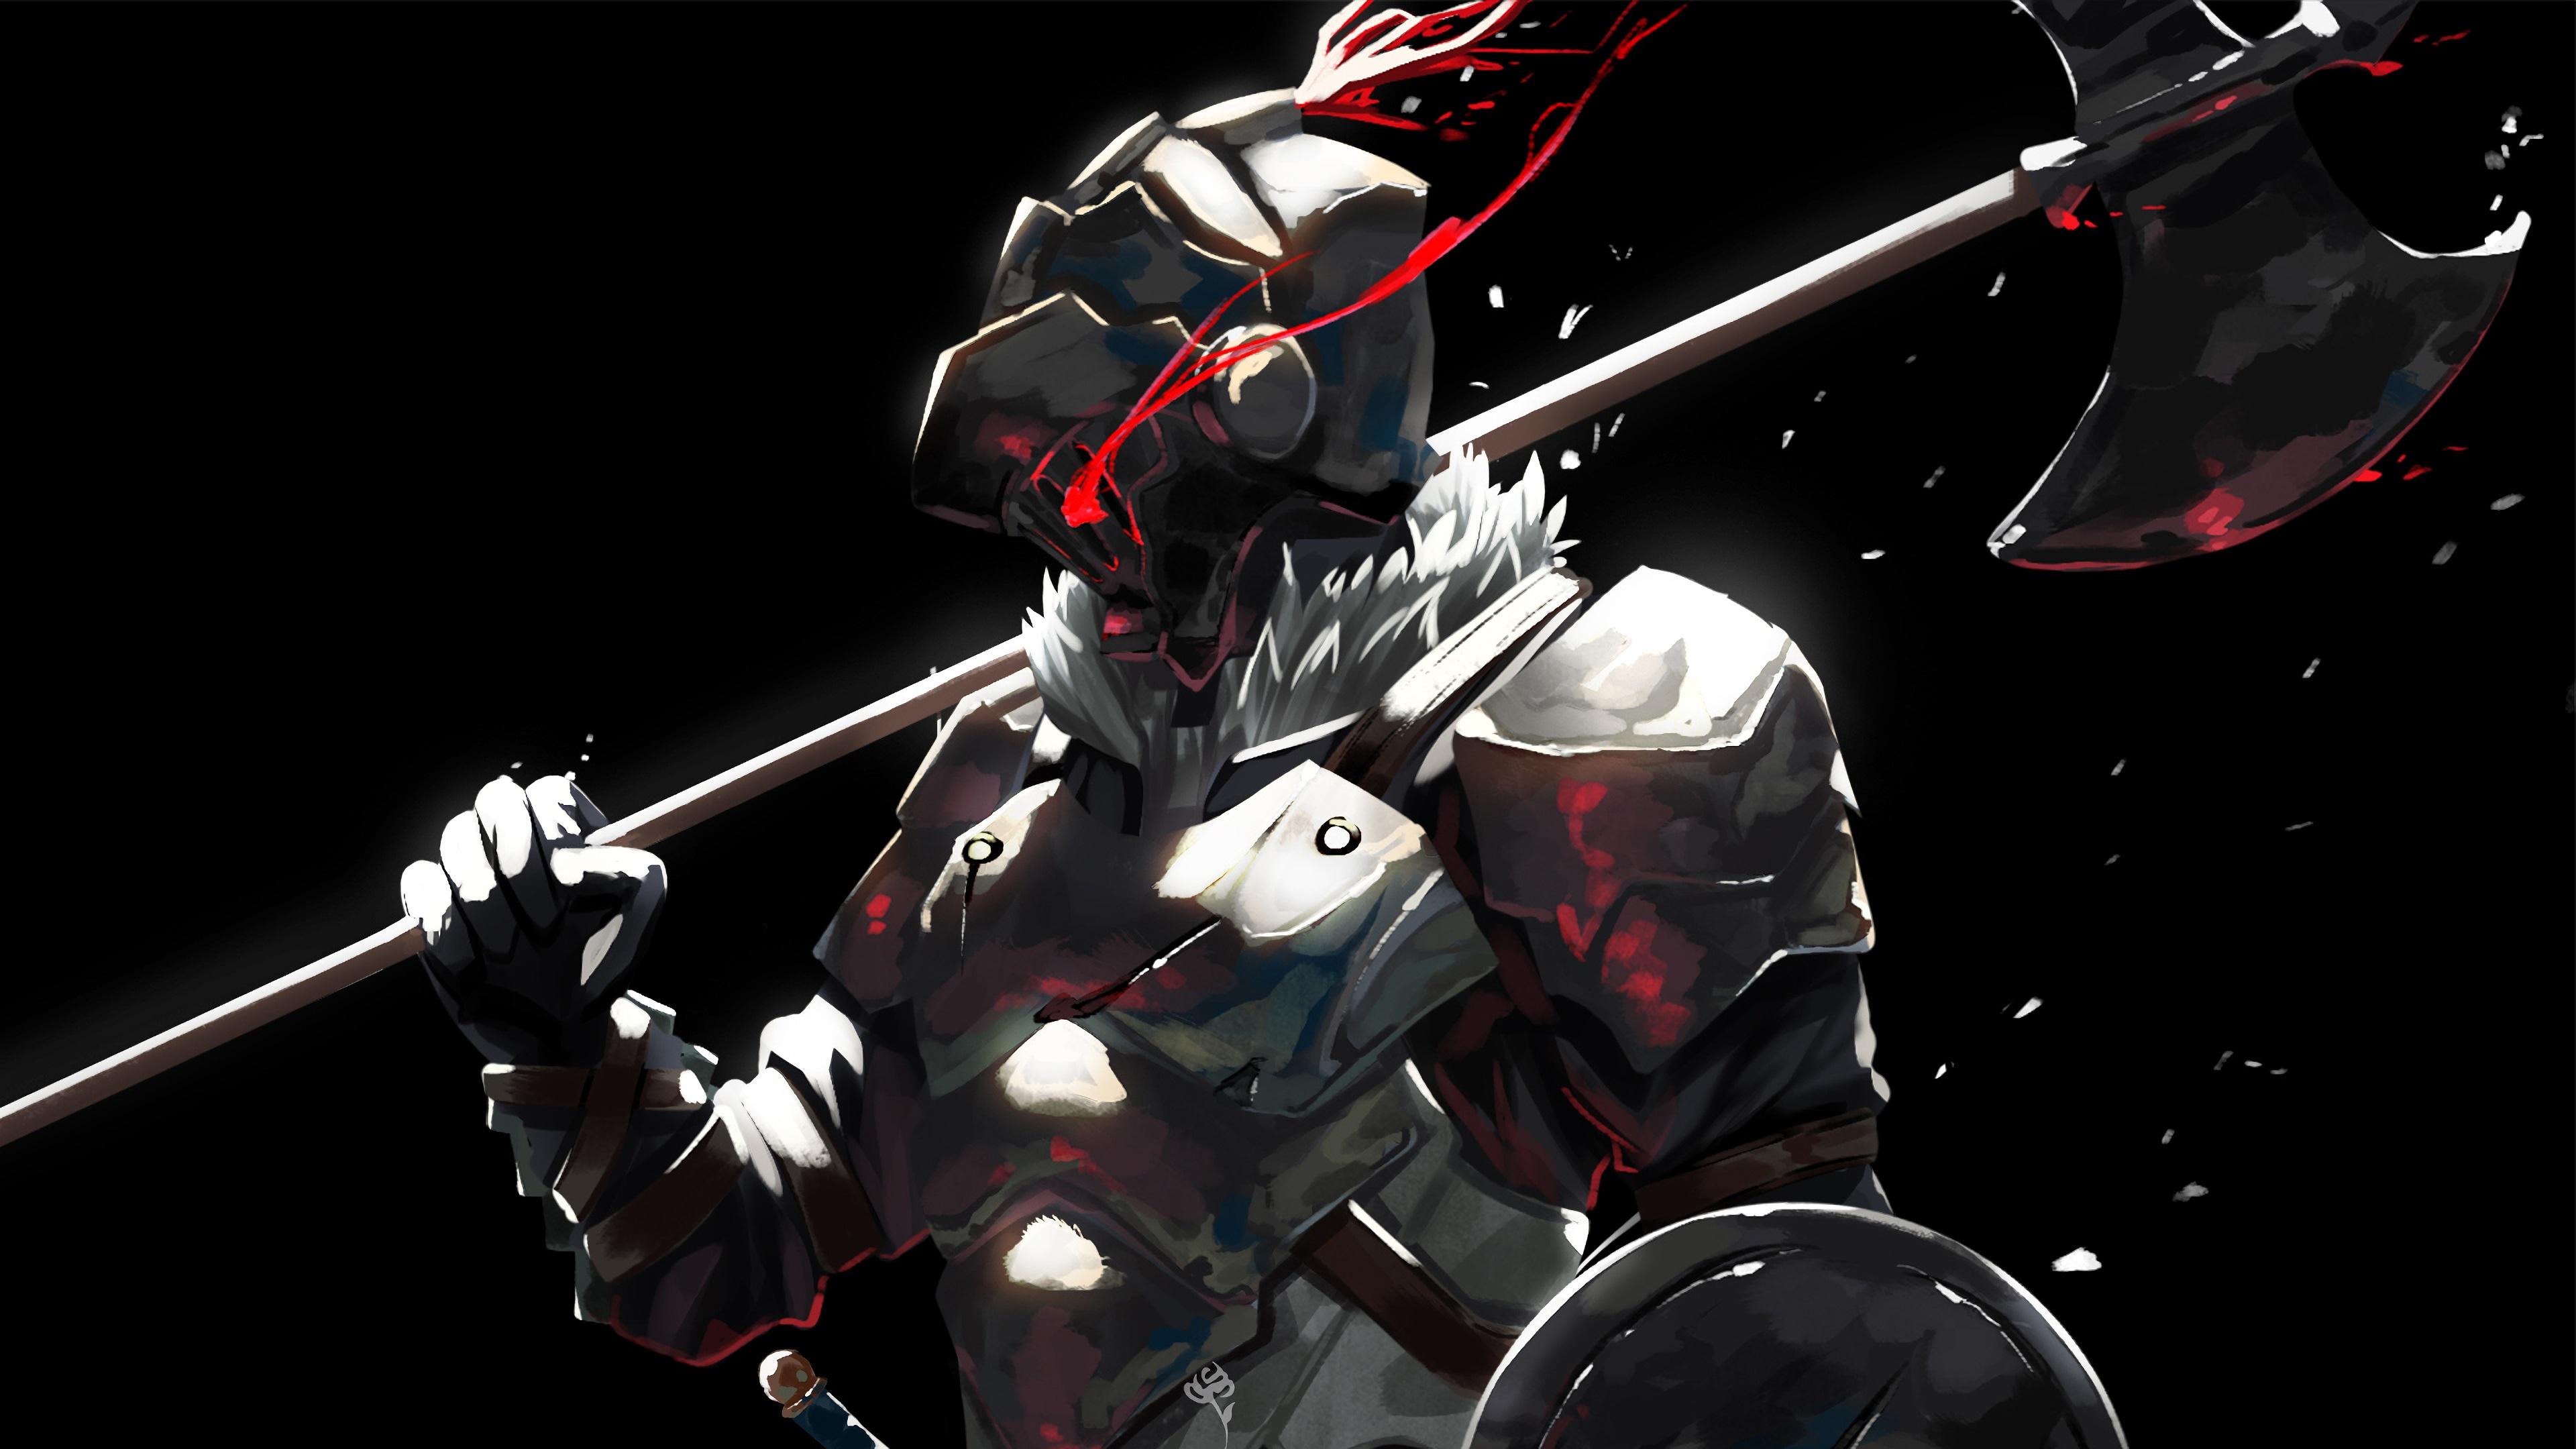 Goblin Slayer 4k Ultra Hd Wallpaper Background Image